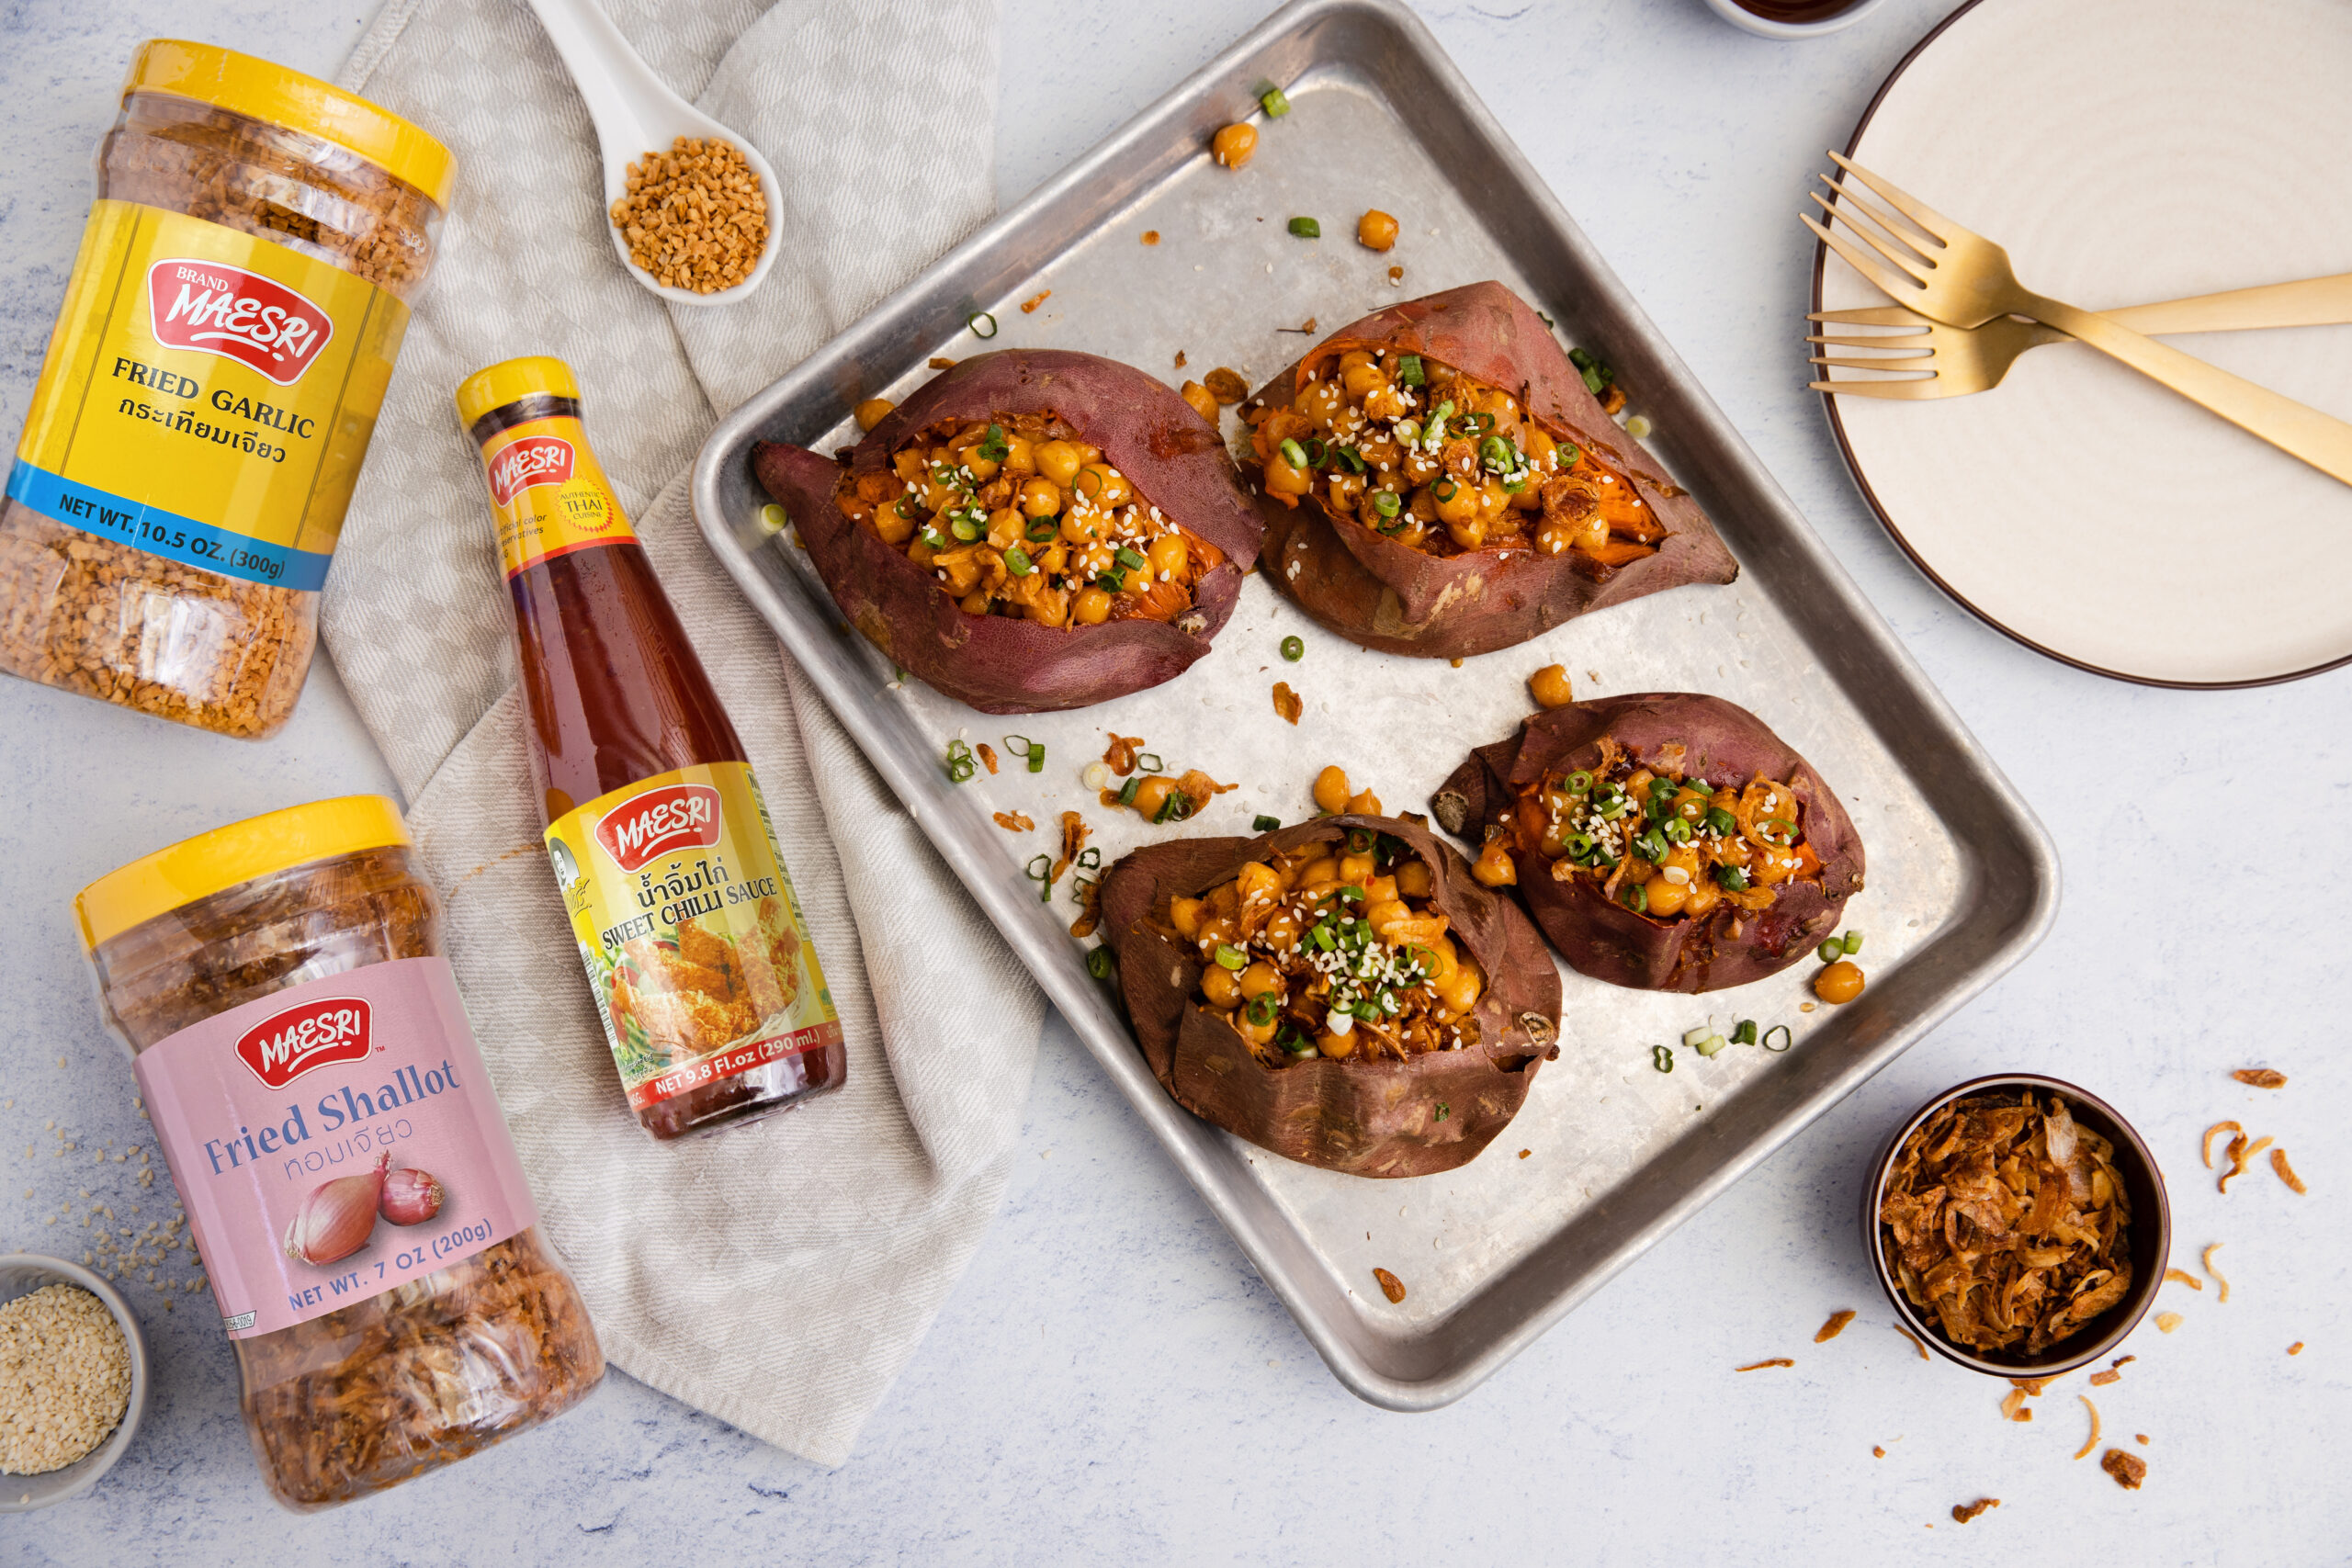 Sticky Chilli Sauce Chickpea-Stuffed Sweet Potatoes